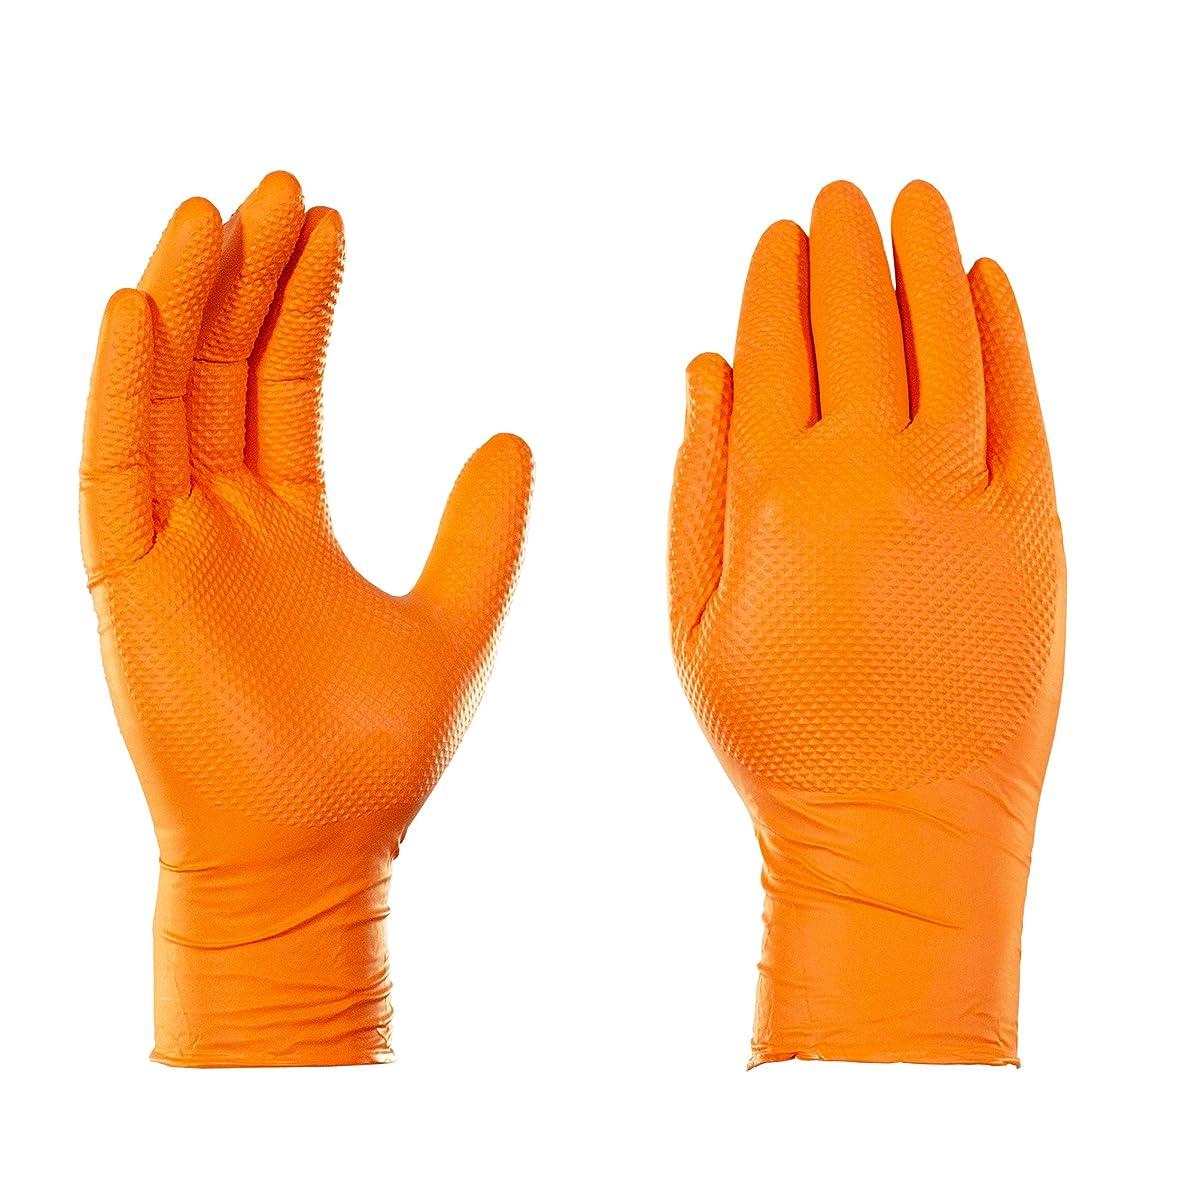 AMMEX Heavy Duty Orange Nitrile 8 Mil Disposale Gloves - Industrial, Extra Thick, Diamond Texture, Powder Free, Ambidextrous, Medium, Box of 100